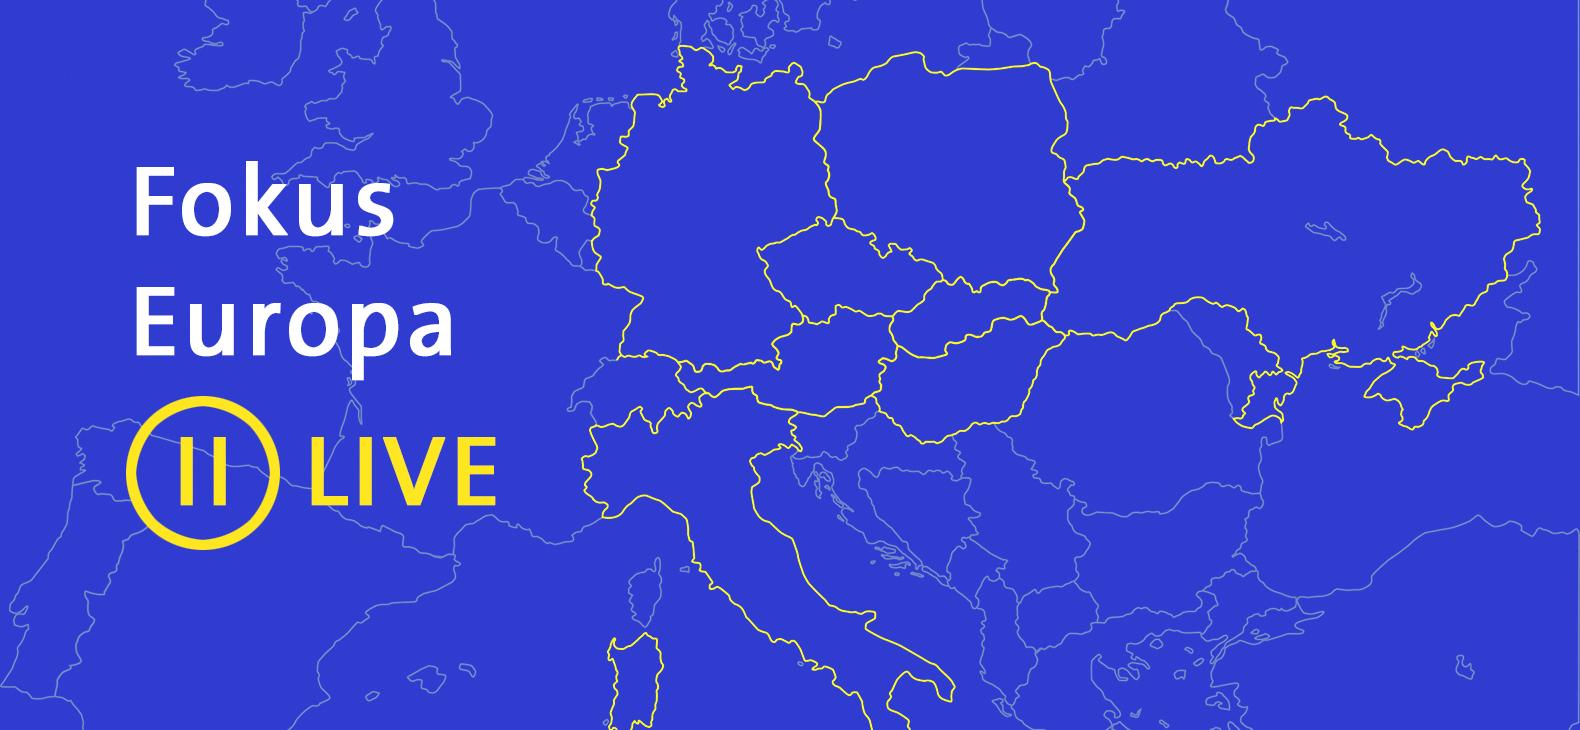 Fokus Europa II LIVE